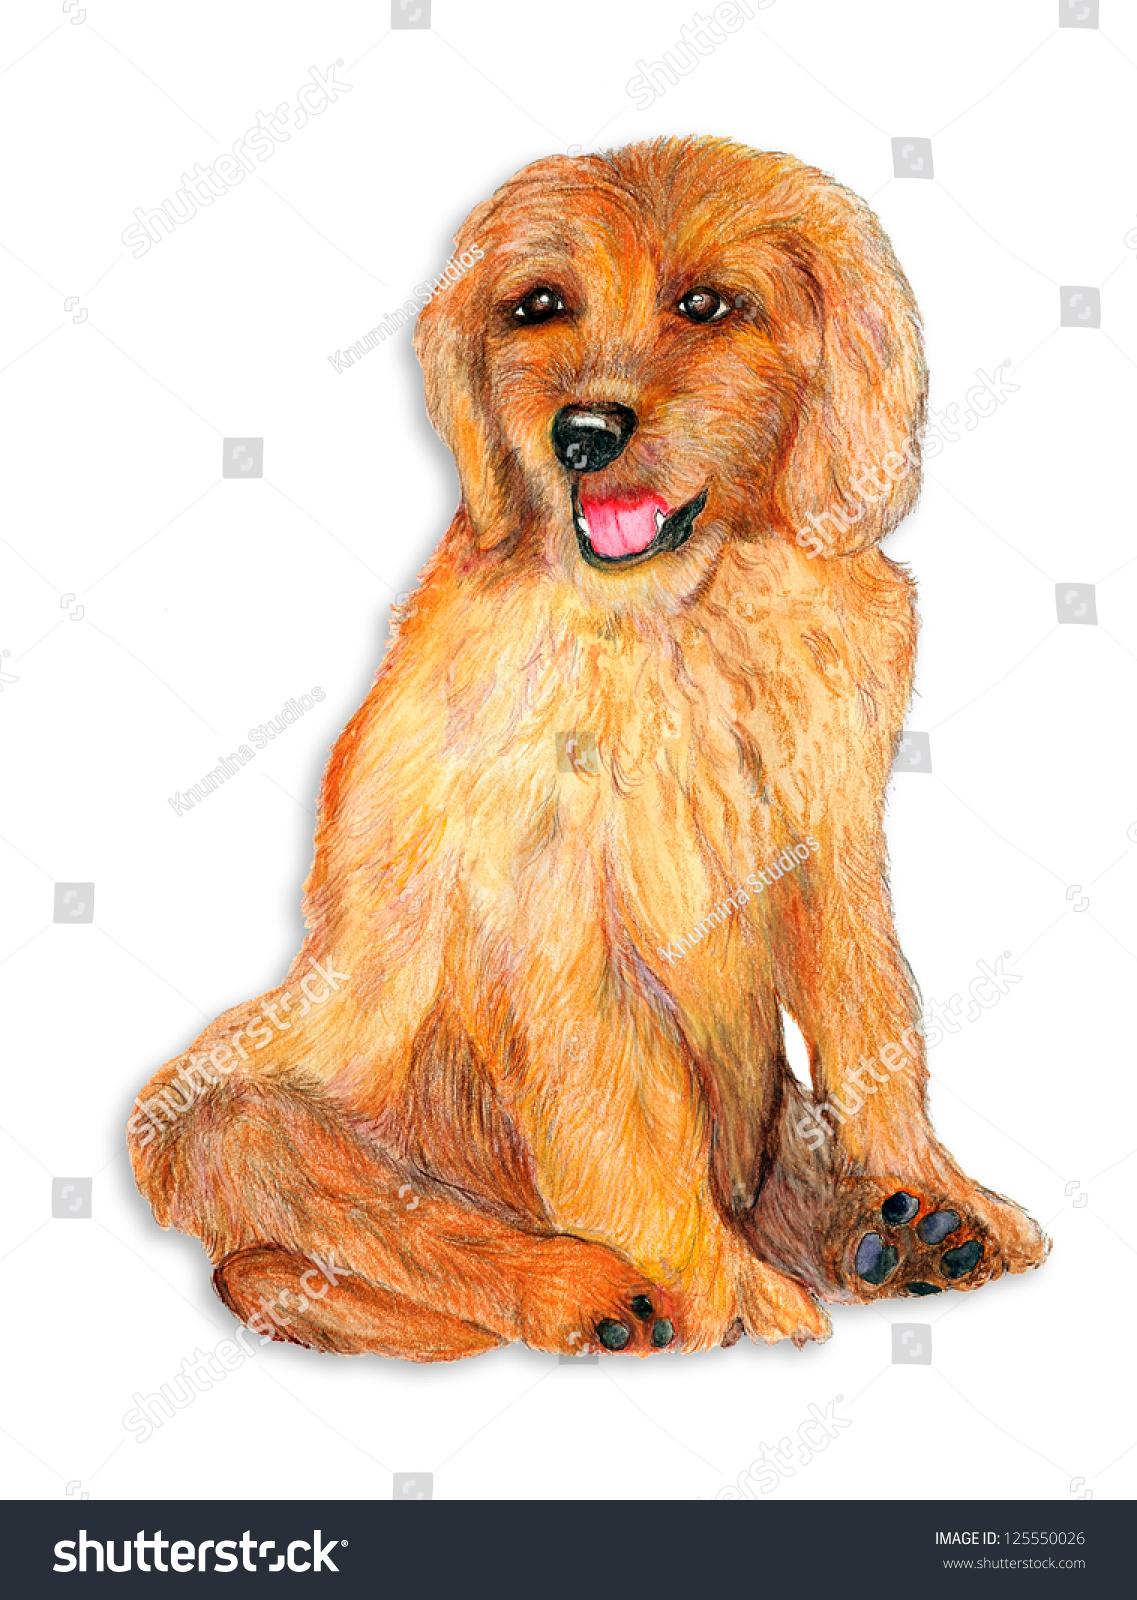 Original Artwork Pencil Watercolor Drawing Goldendoodle Stock Photo Edit Now 125550026